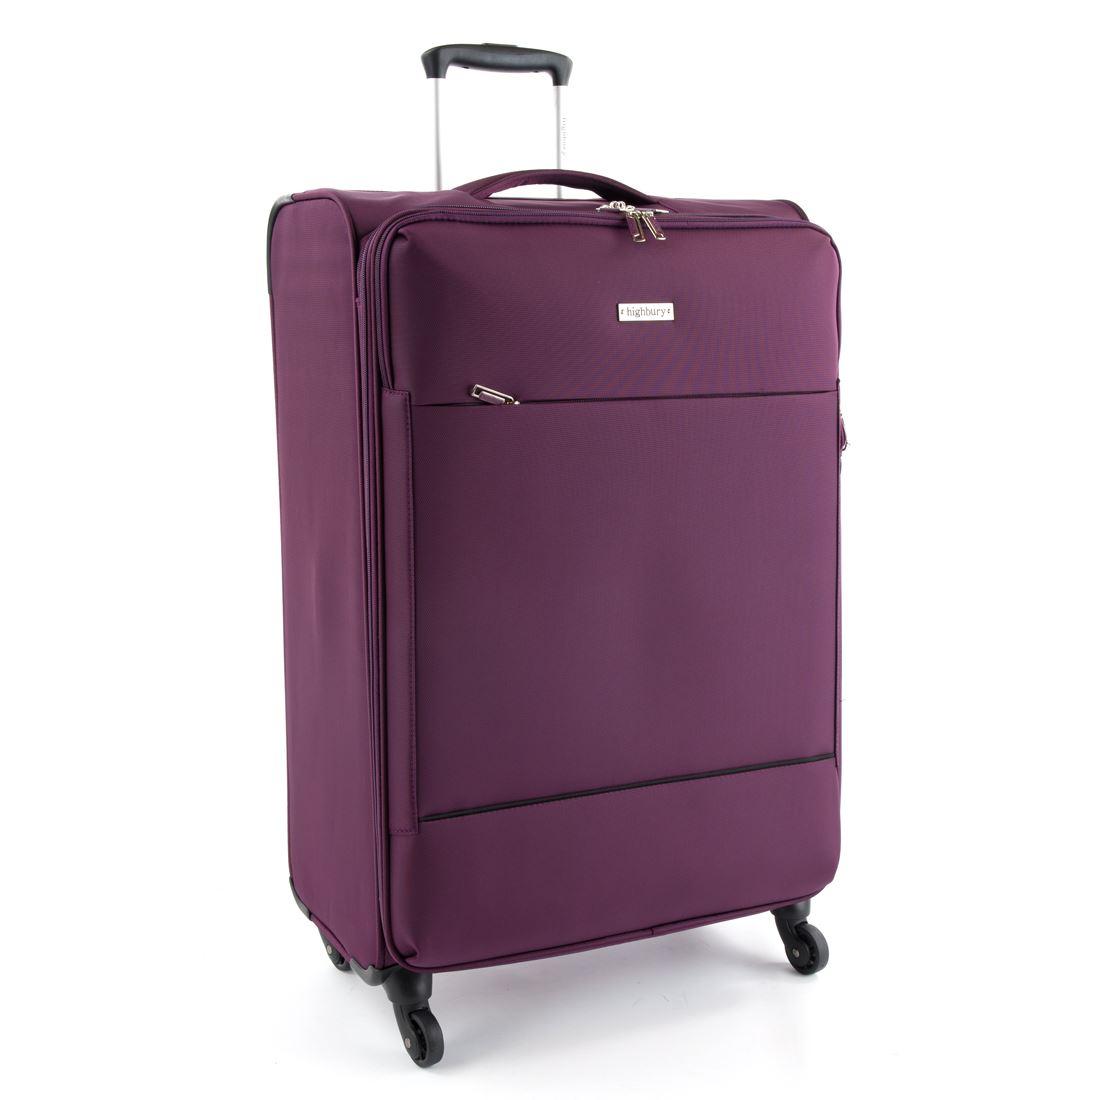 highbury suitcase luggage lightweight 4 wheel trolley. Black Bedroom Furniture Sets. Home Design Ideas